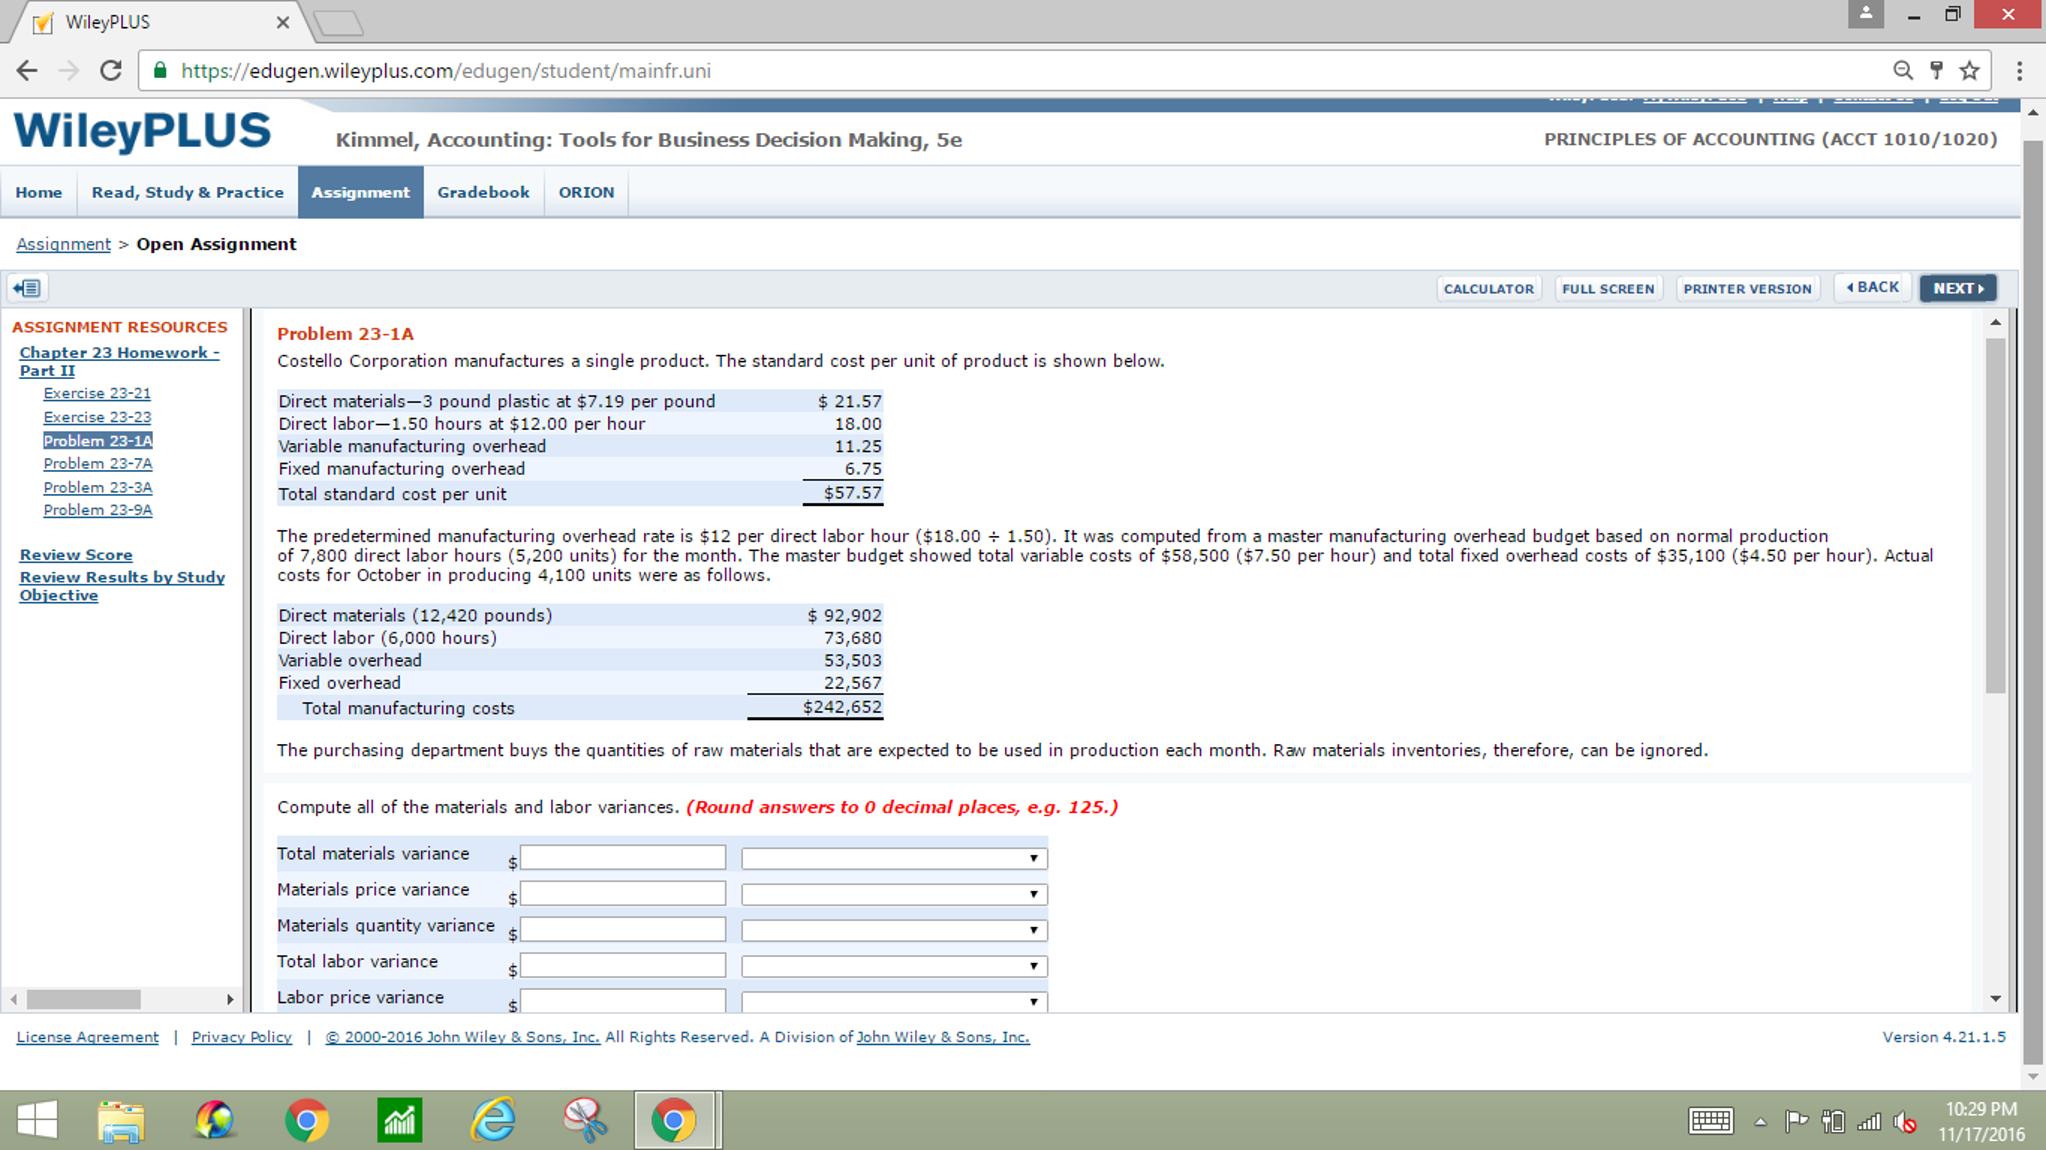 Question: WileyPLUS https:// edugen wiley plus.com/edugen/student/mainfr.un Wiley  PLUS Kimmel, Accounting: .